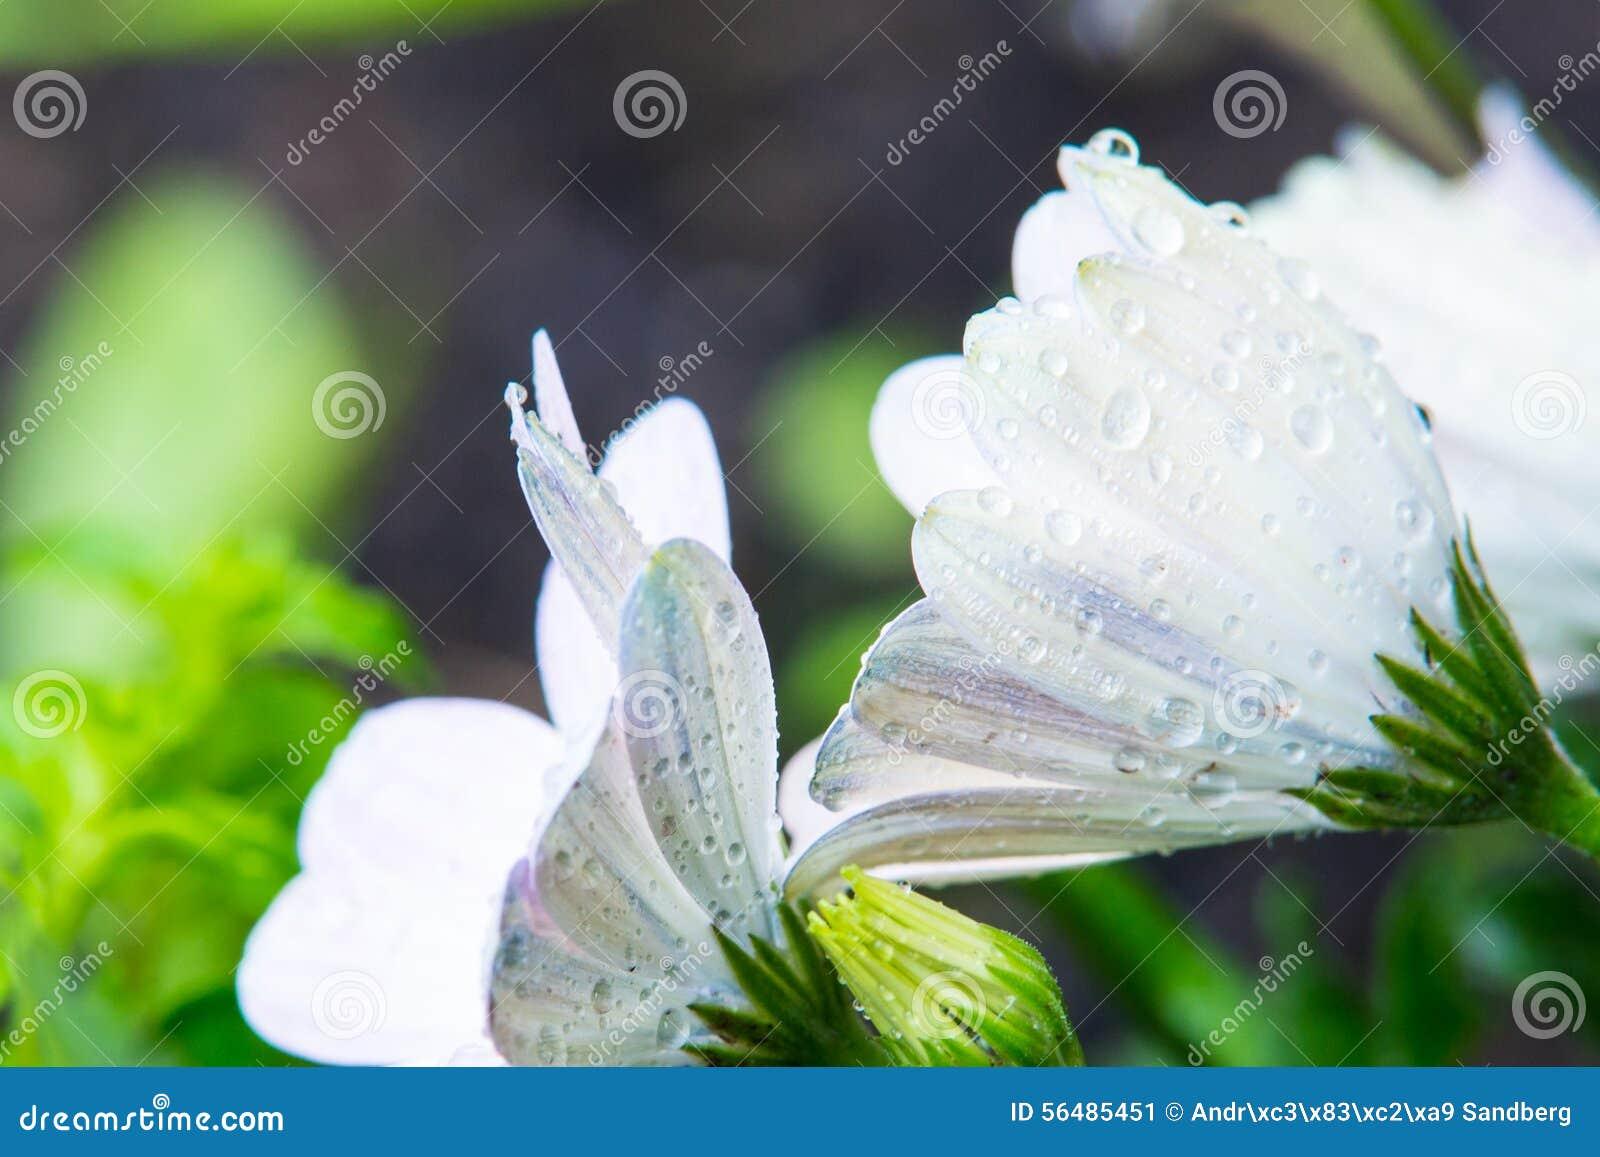 Fleurs blanches avec Waterdrops